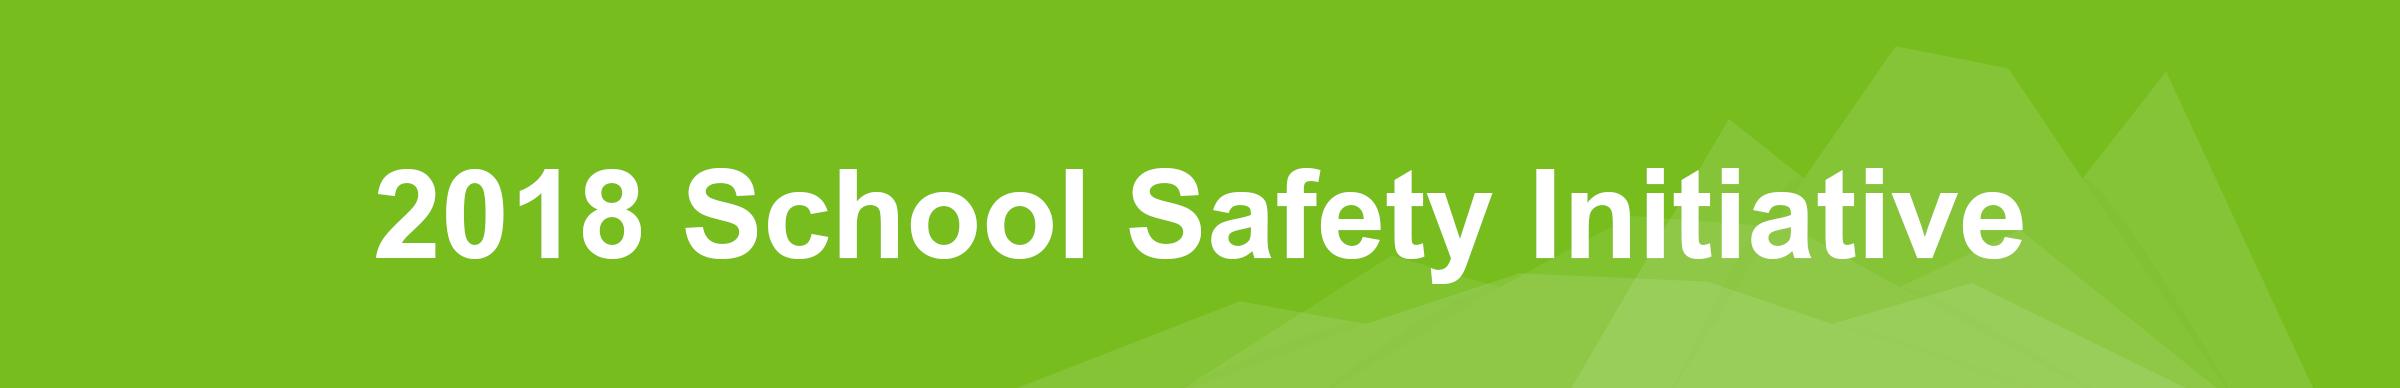 School Safety Initiative